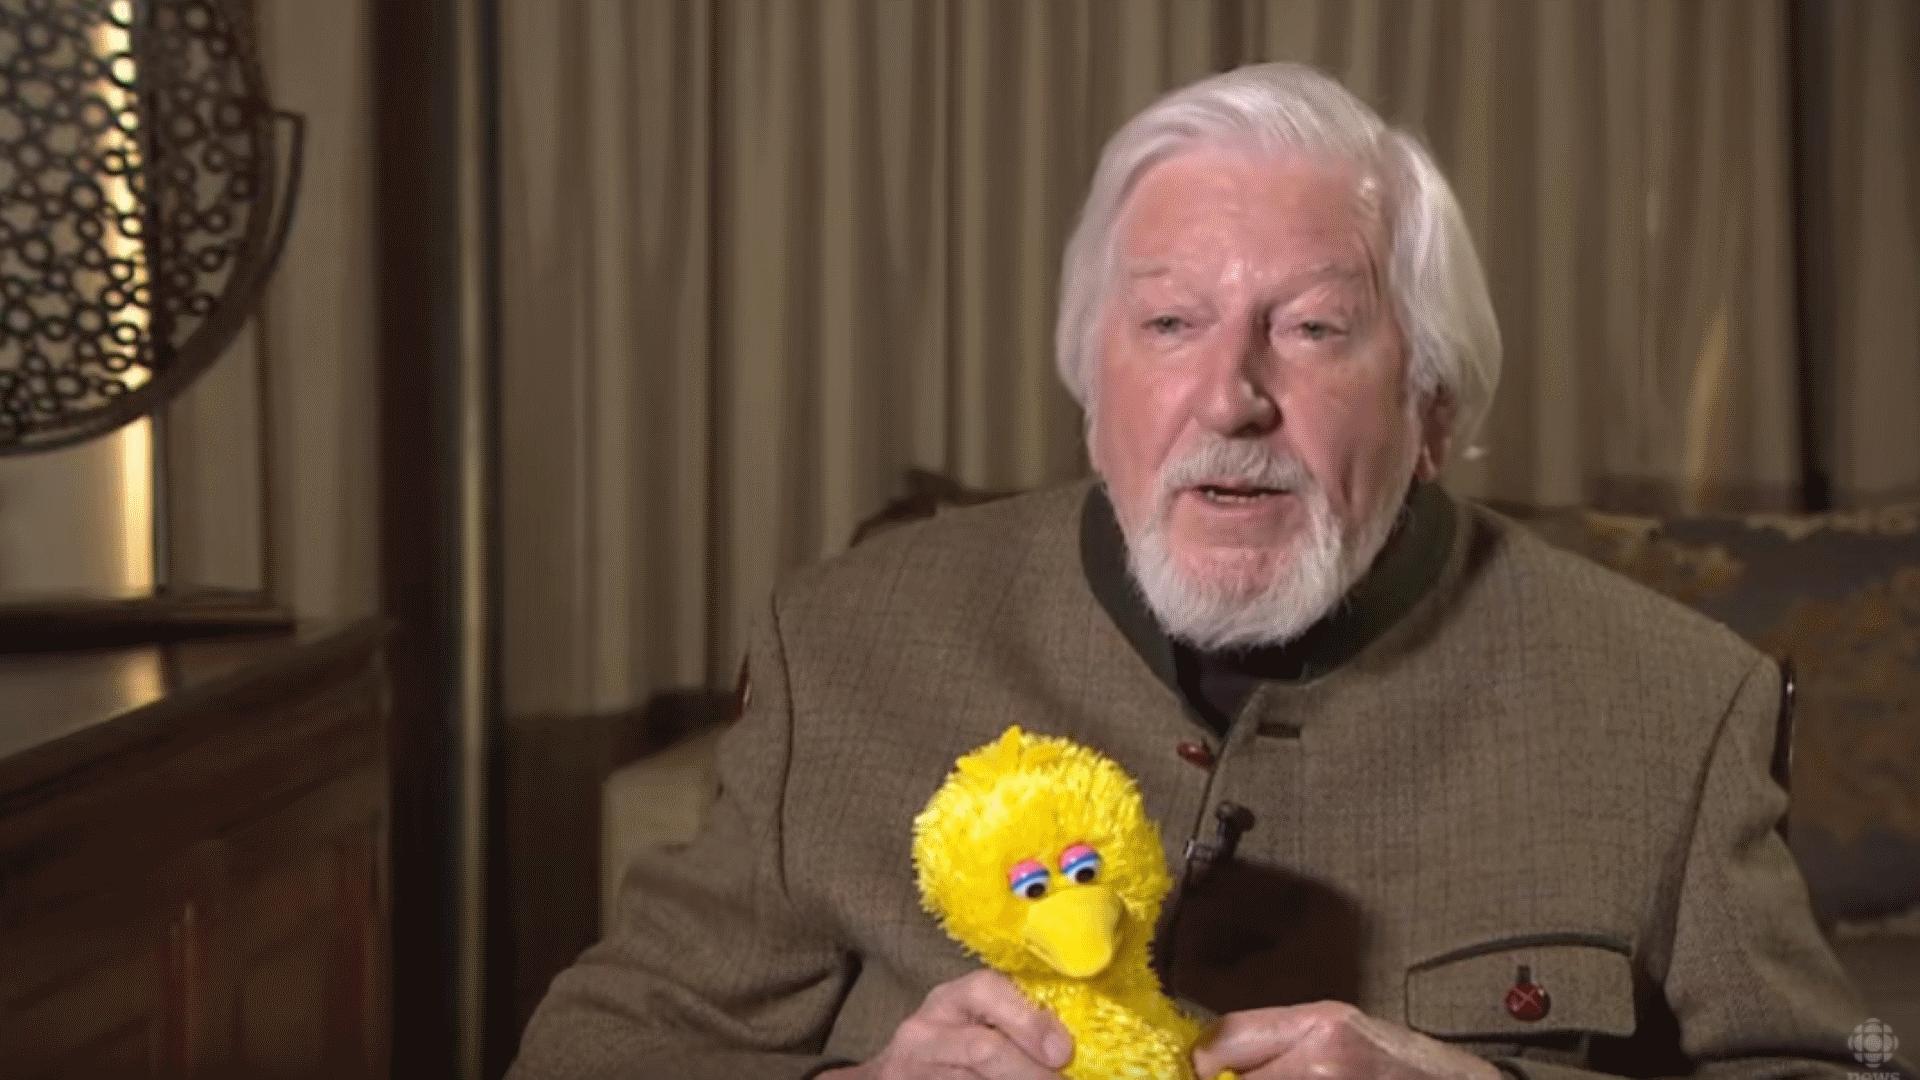 Caroll Spinney Voice Of Sesame Street Characters Big Bird